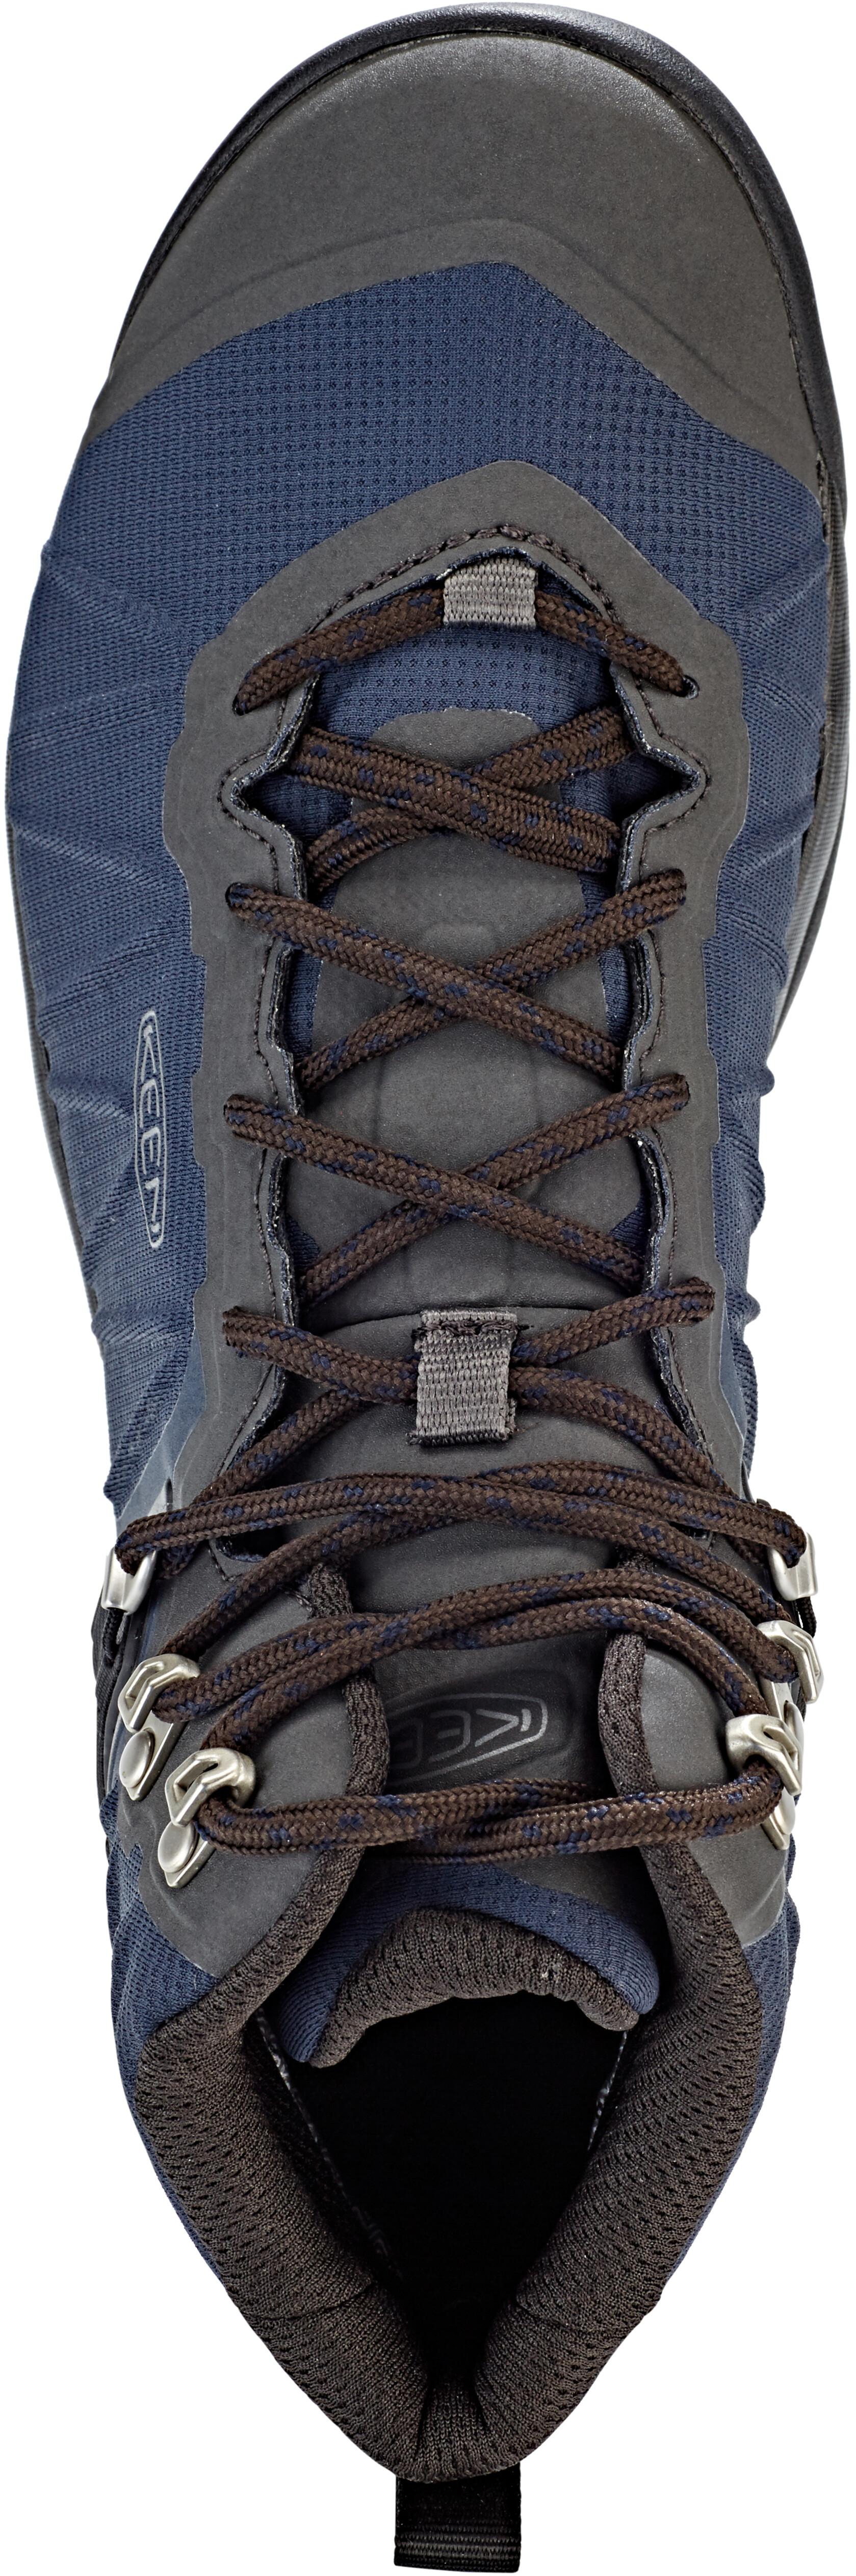 759242676a8 Keen Venture WP Mid Shoes Men blue nights/raven